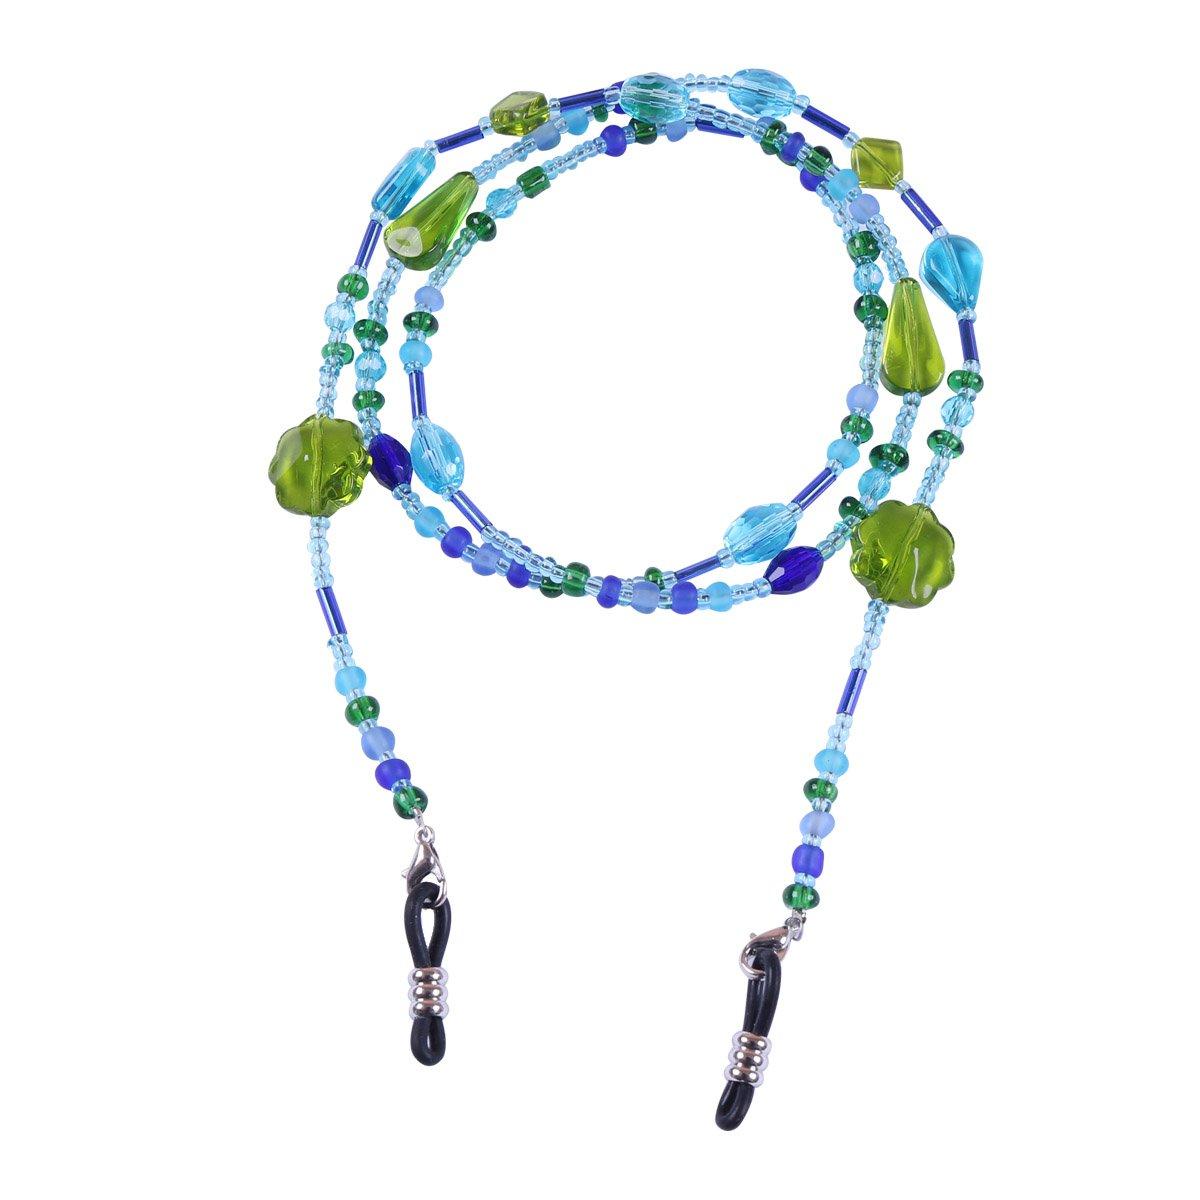 CHICTRY Beads Eyeglass Chain Holder Women Sunglass Eyewear Strap Lanyard Holder Cords Necklace Blue One Size